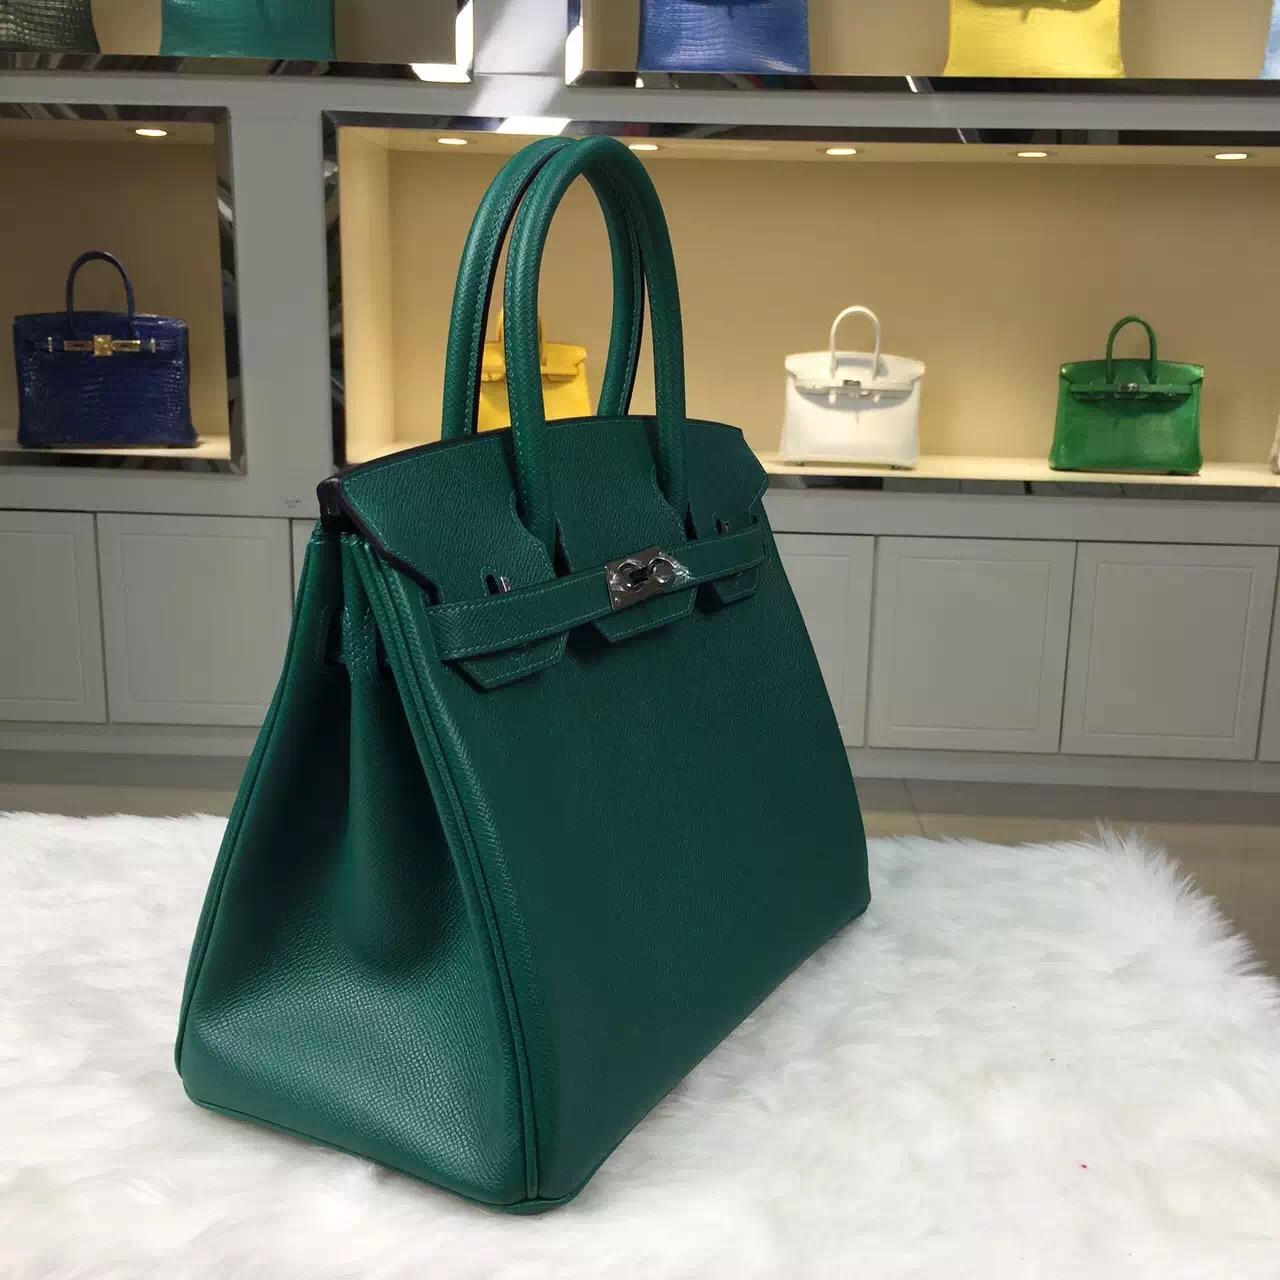 Hermes Z6 Malachite Green Epsom leather Personal Tailor Birkin Bag 30CM